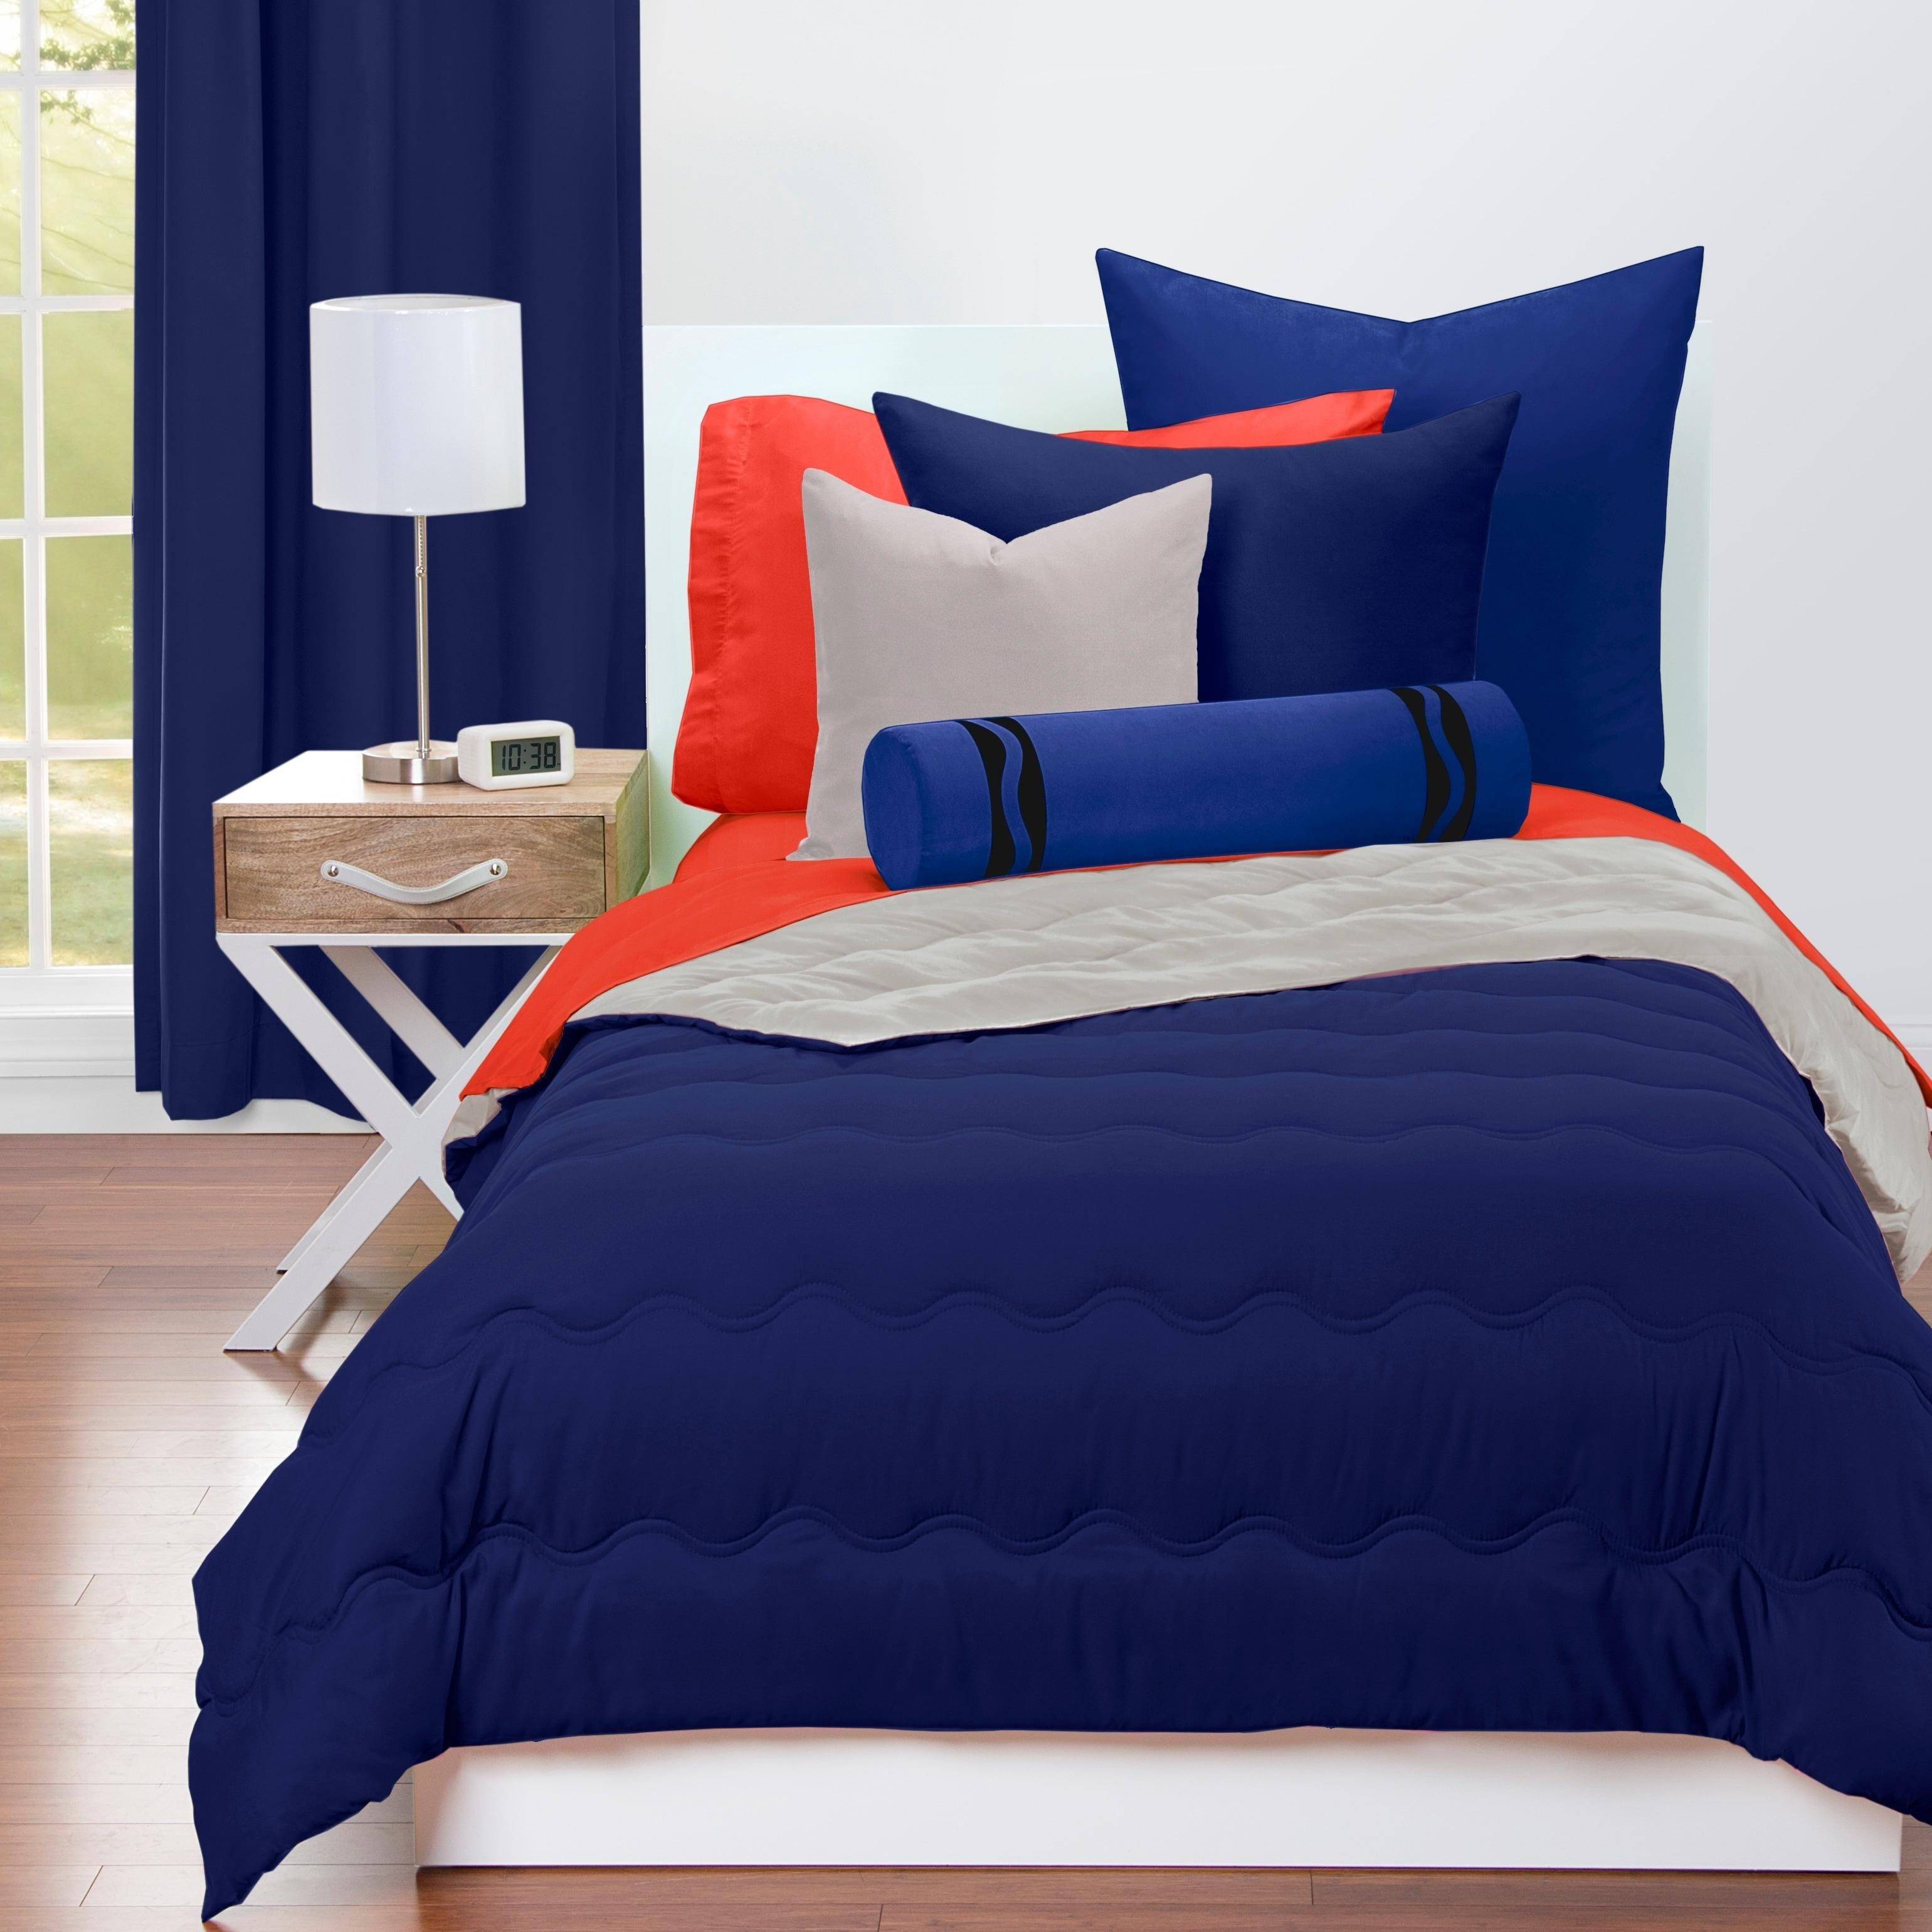 Shop Crayola Navy Blue And Timberwolf Reversible 3 Piece Comforter